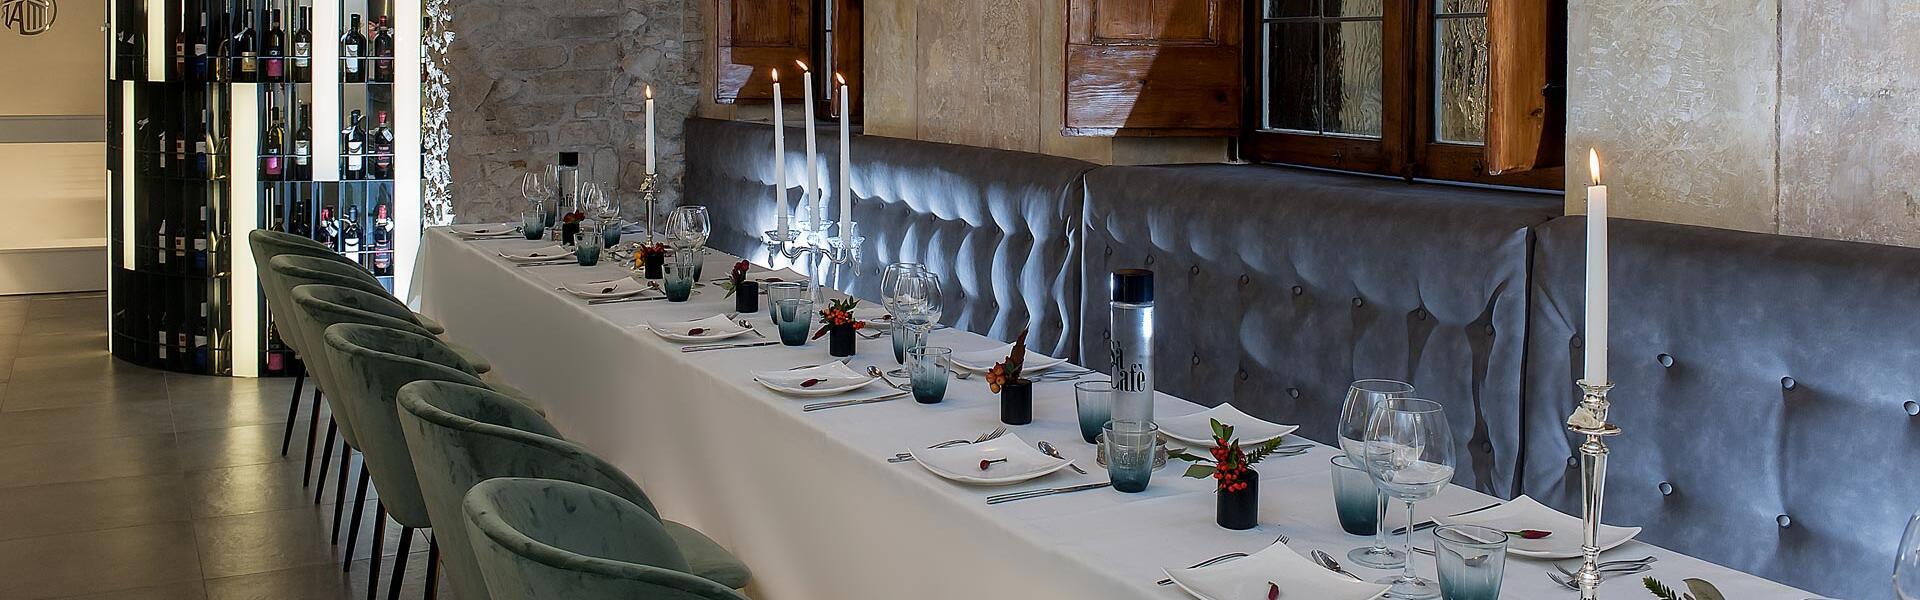 argentinastylehotel en sa-cafe 005